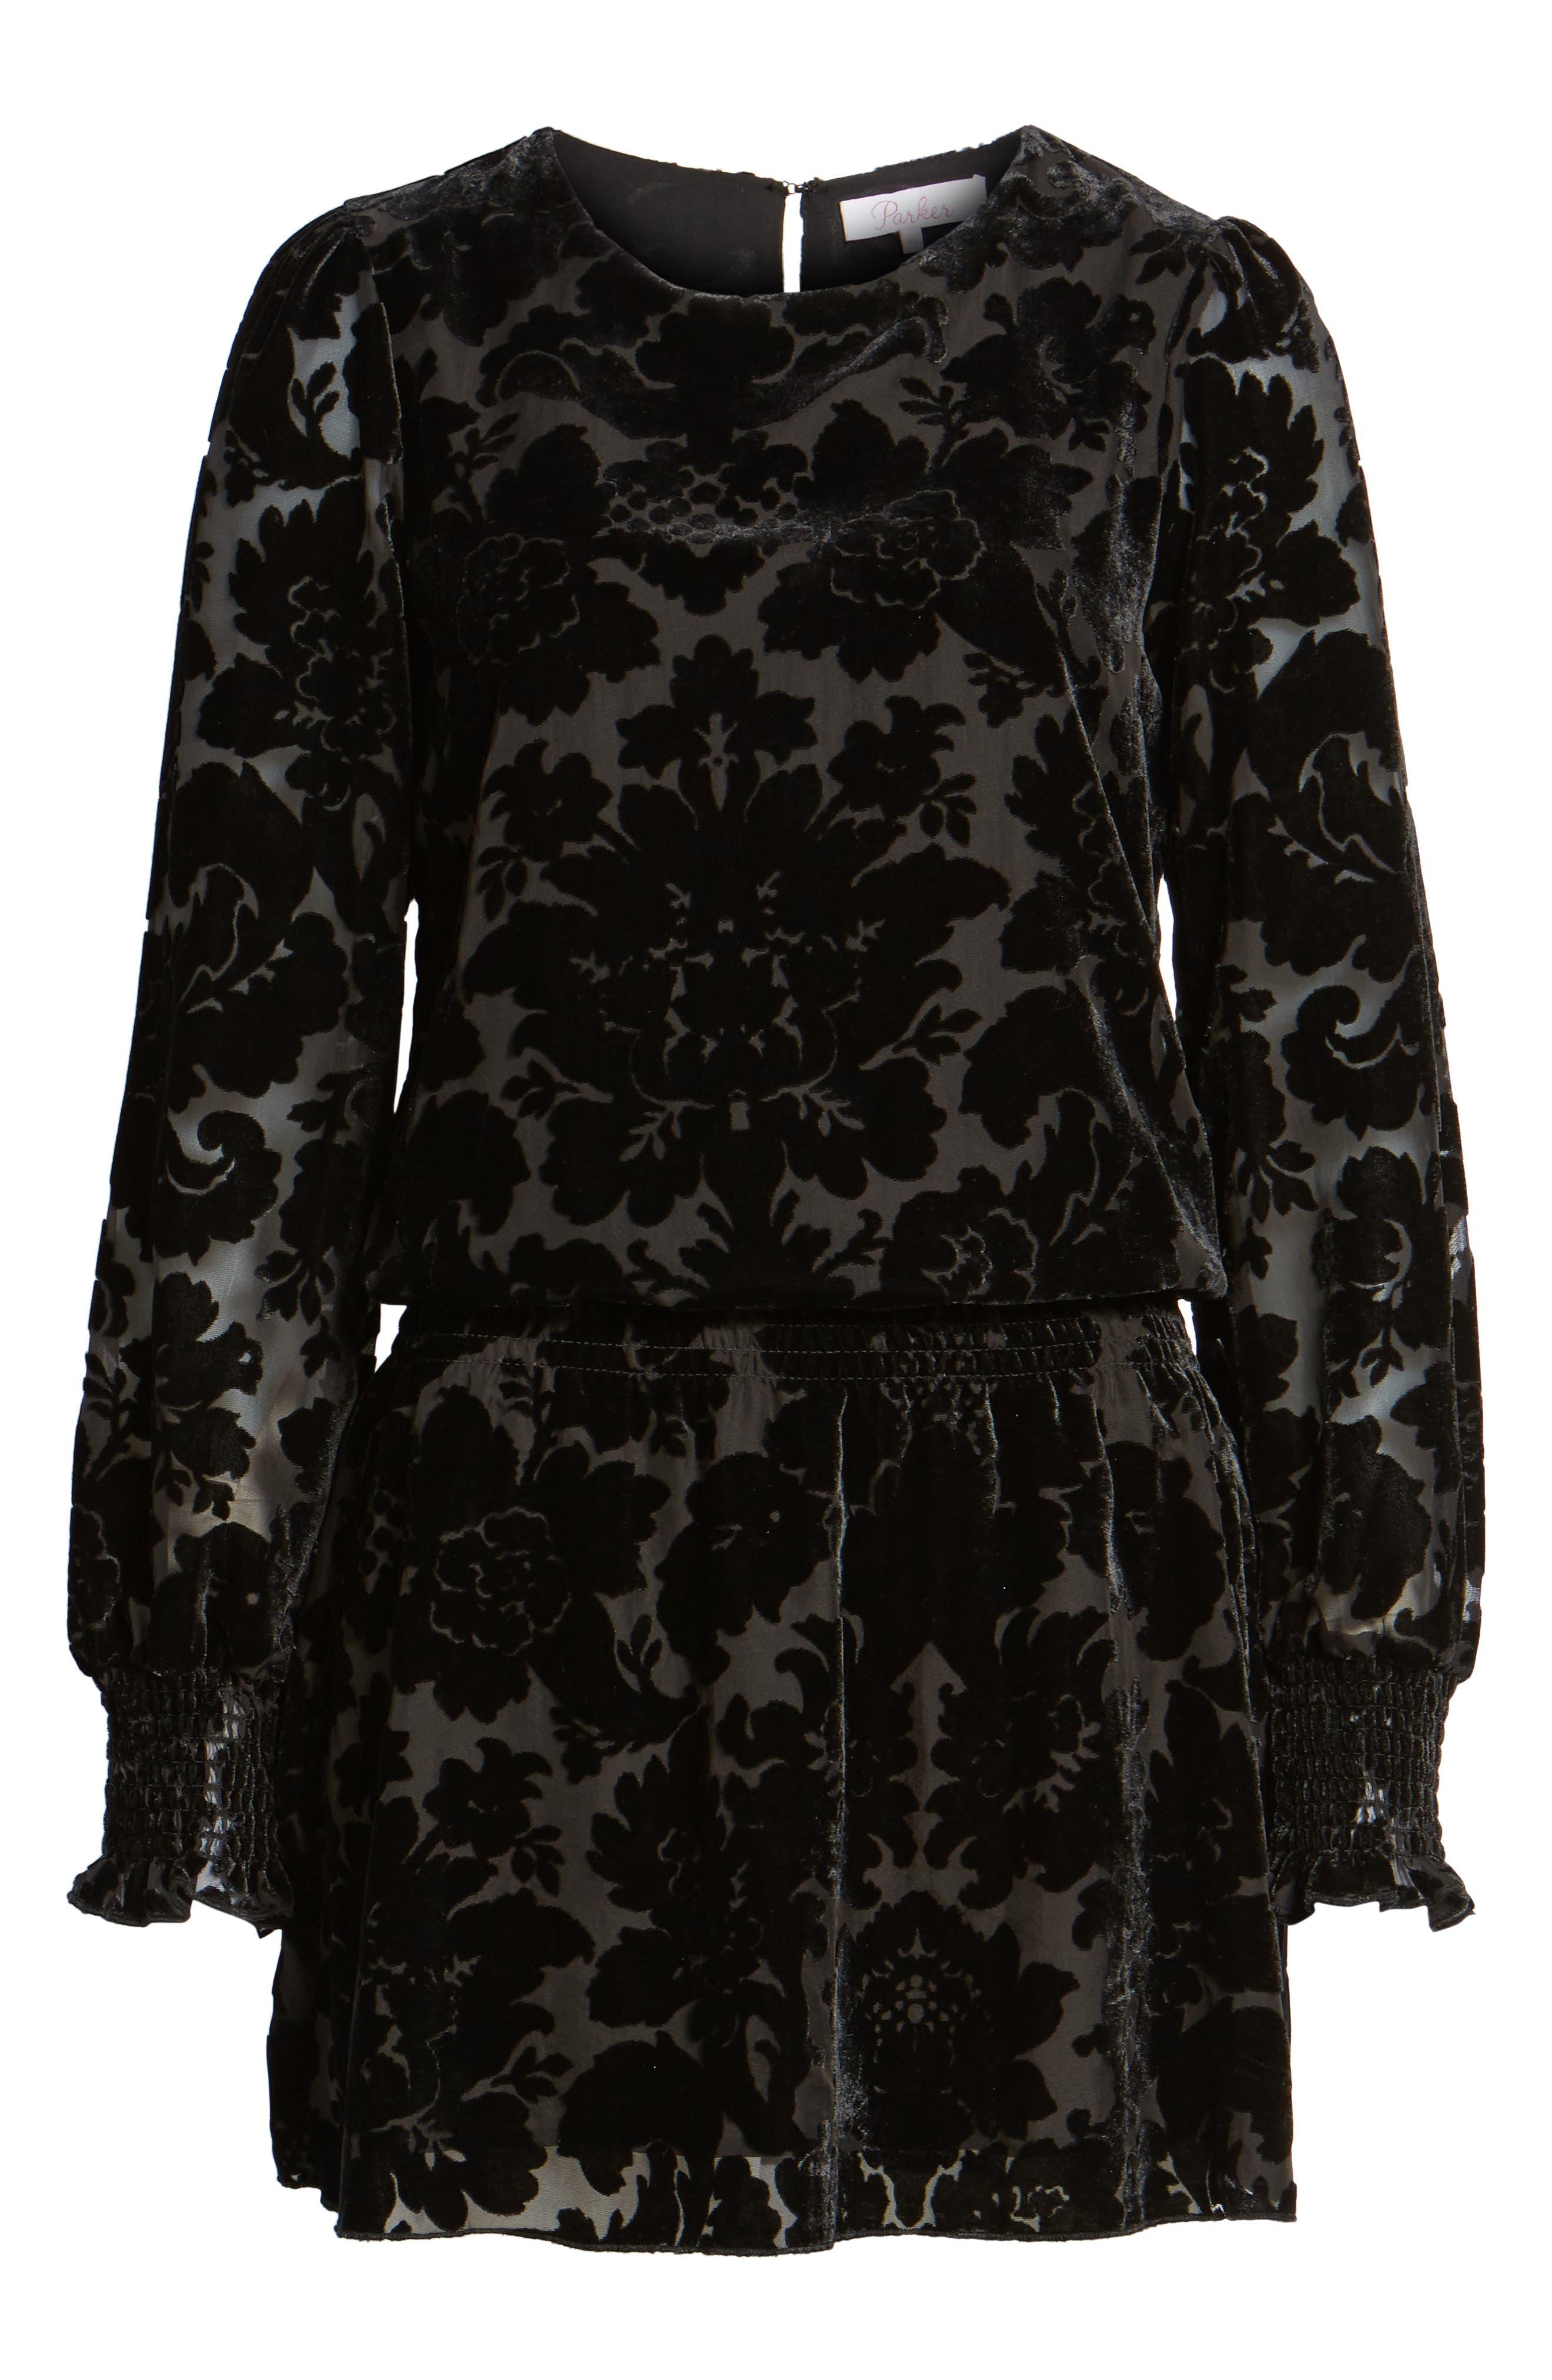 Carmindy Blouson Dress,                             Alternate thumbnail 6, color,                             001